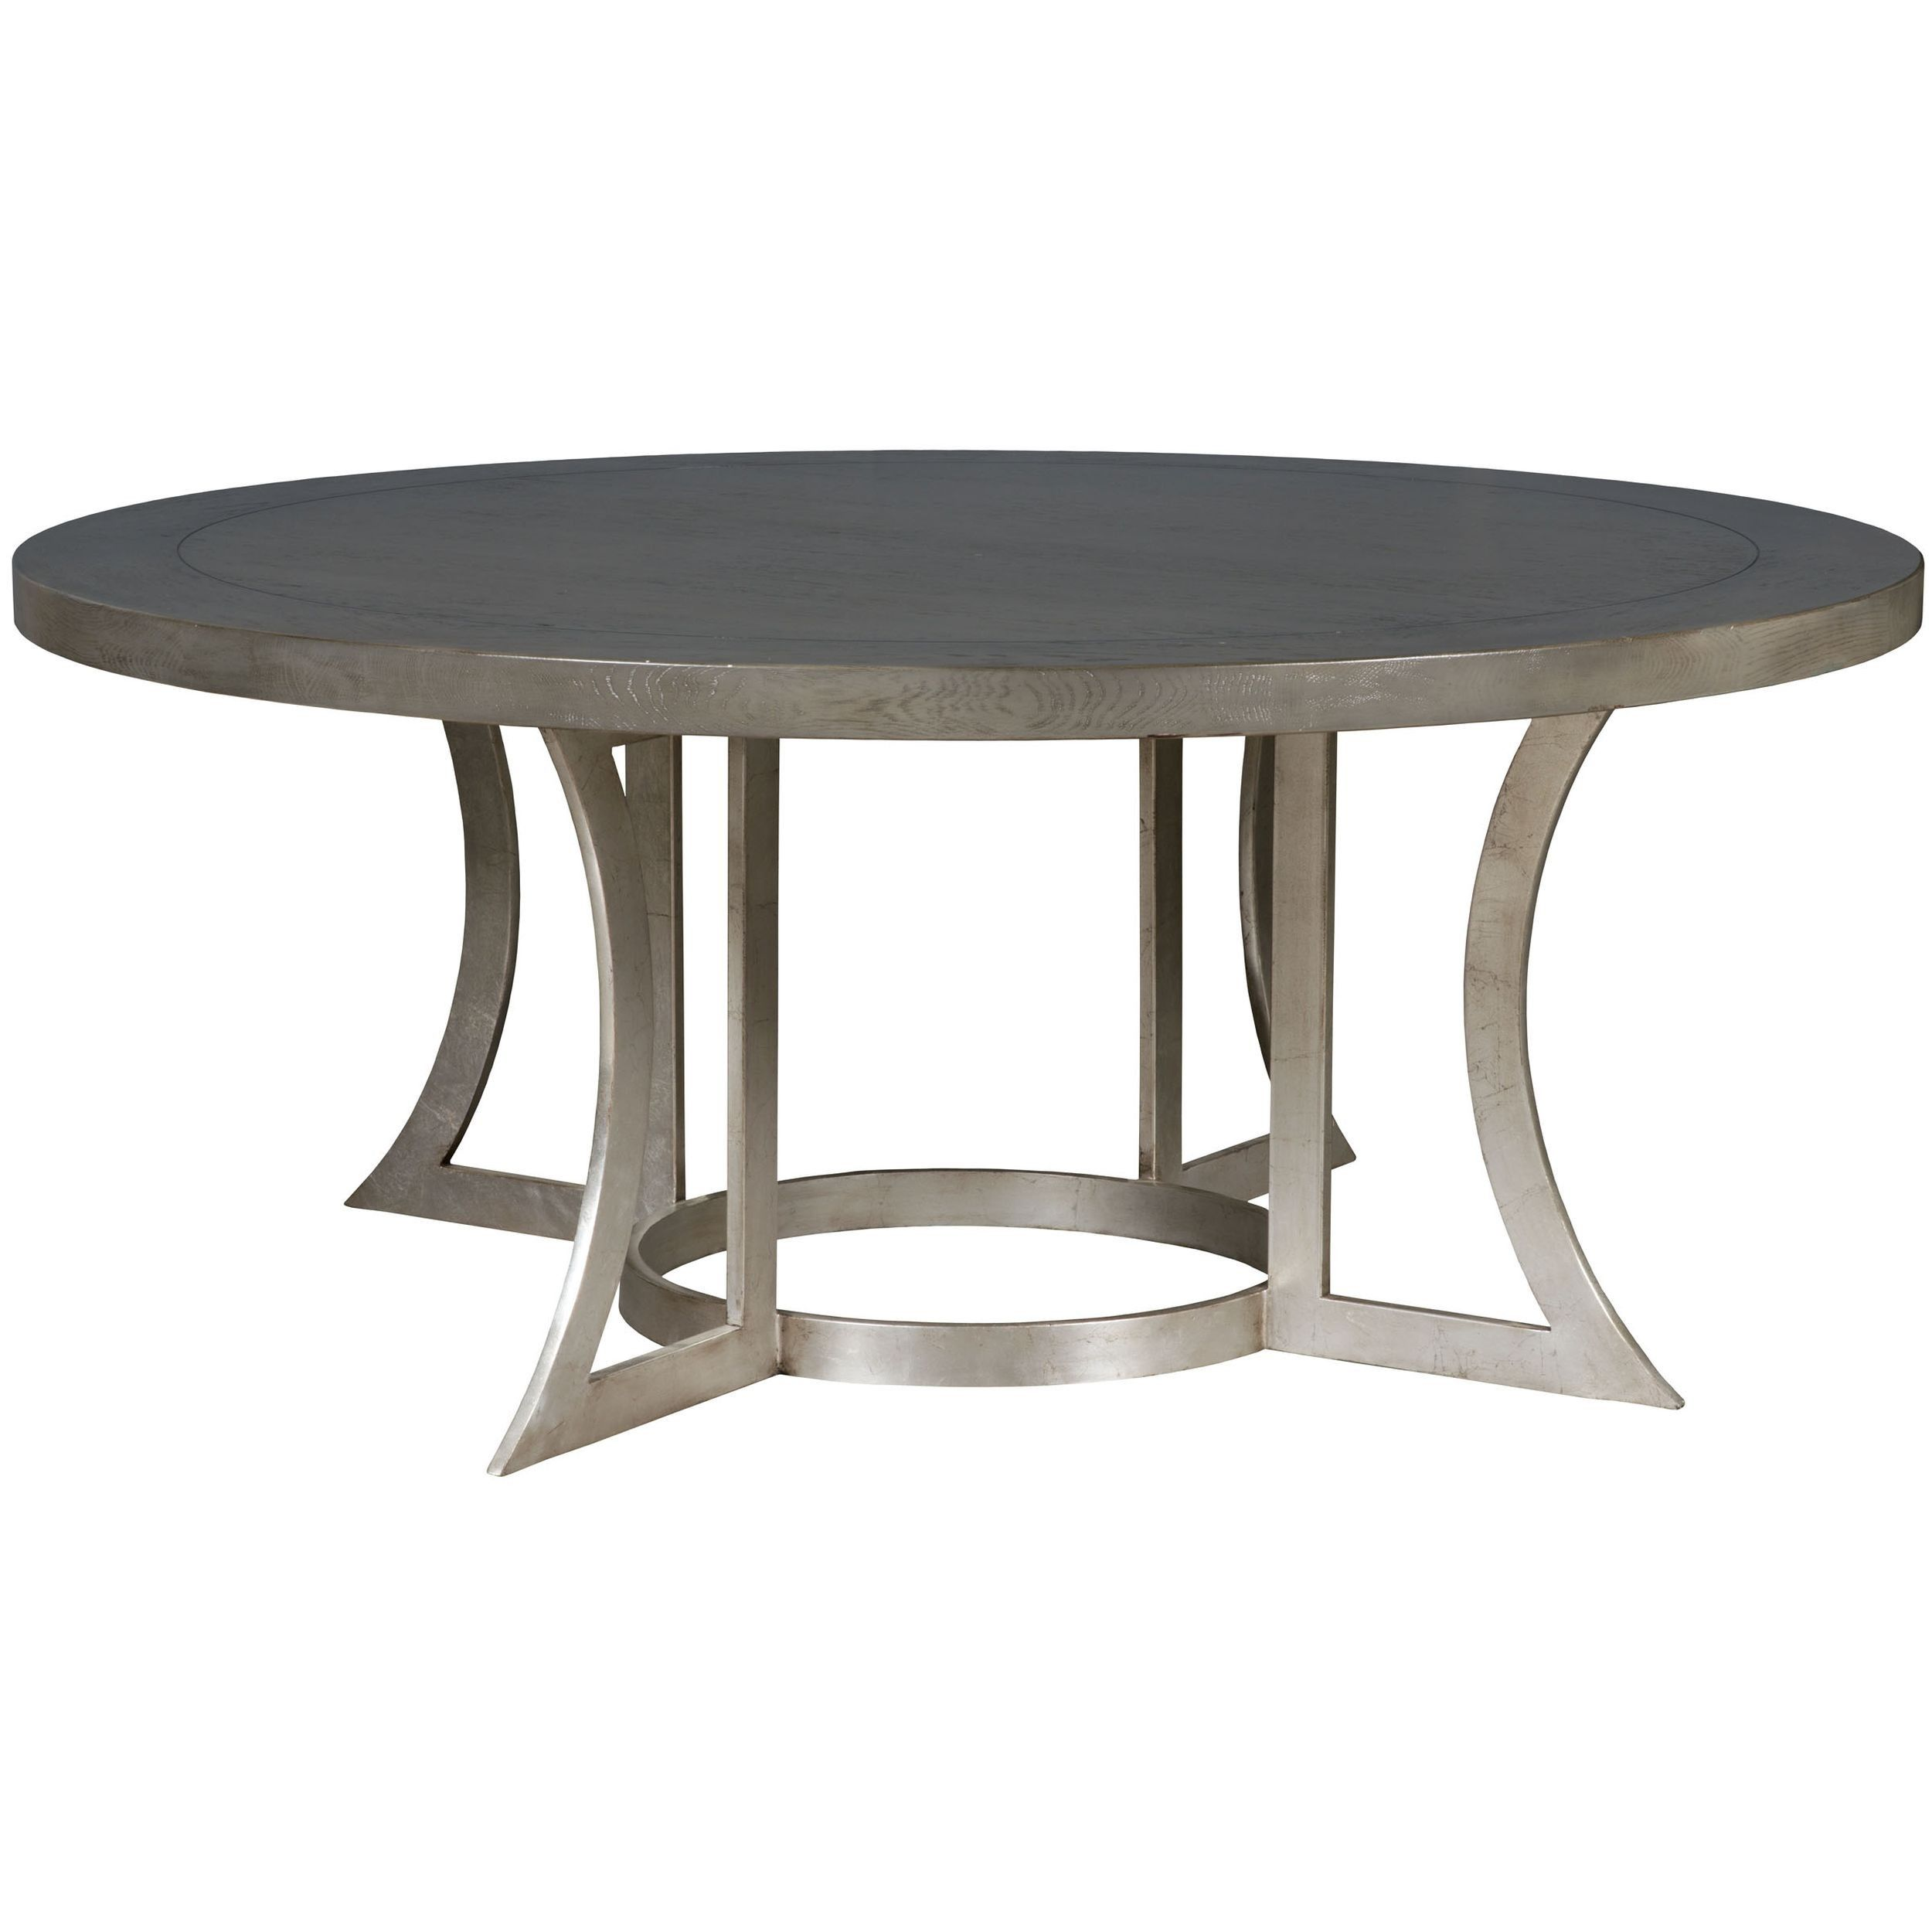 Vanguard Furniture Bordino Dining Table